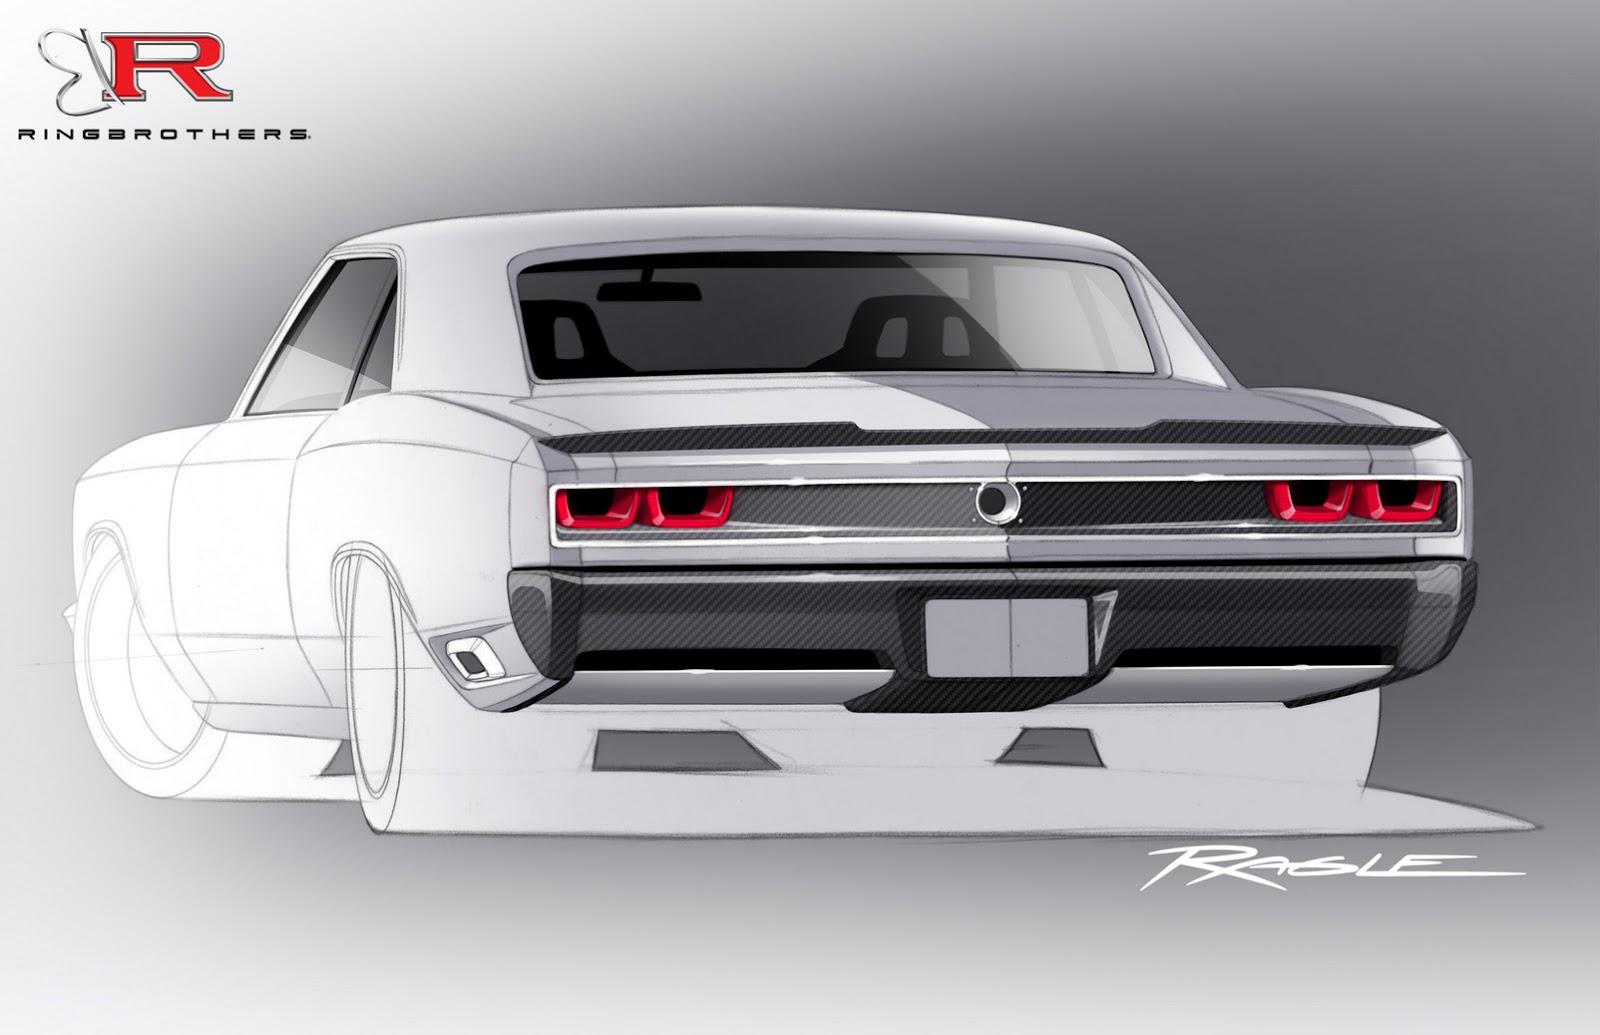 Ringbrothers recoil chevrolet chevelle heading to sema packs 980 horsepower autoevolution